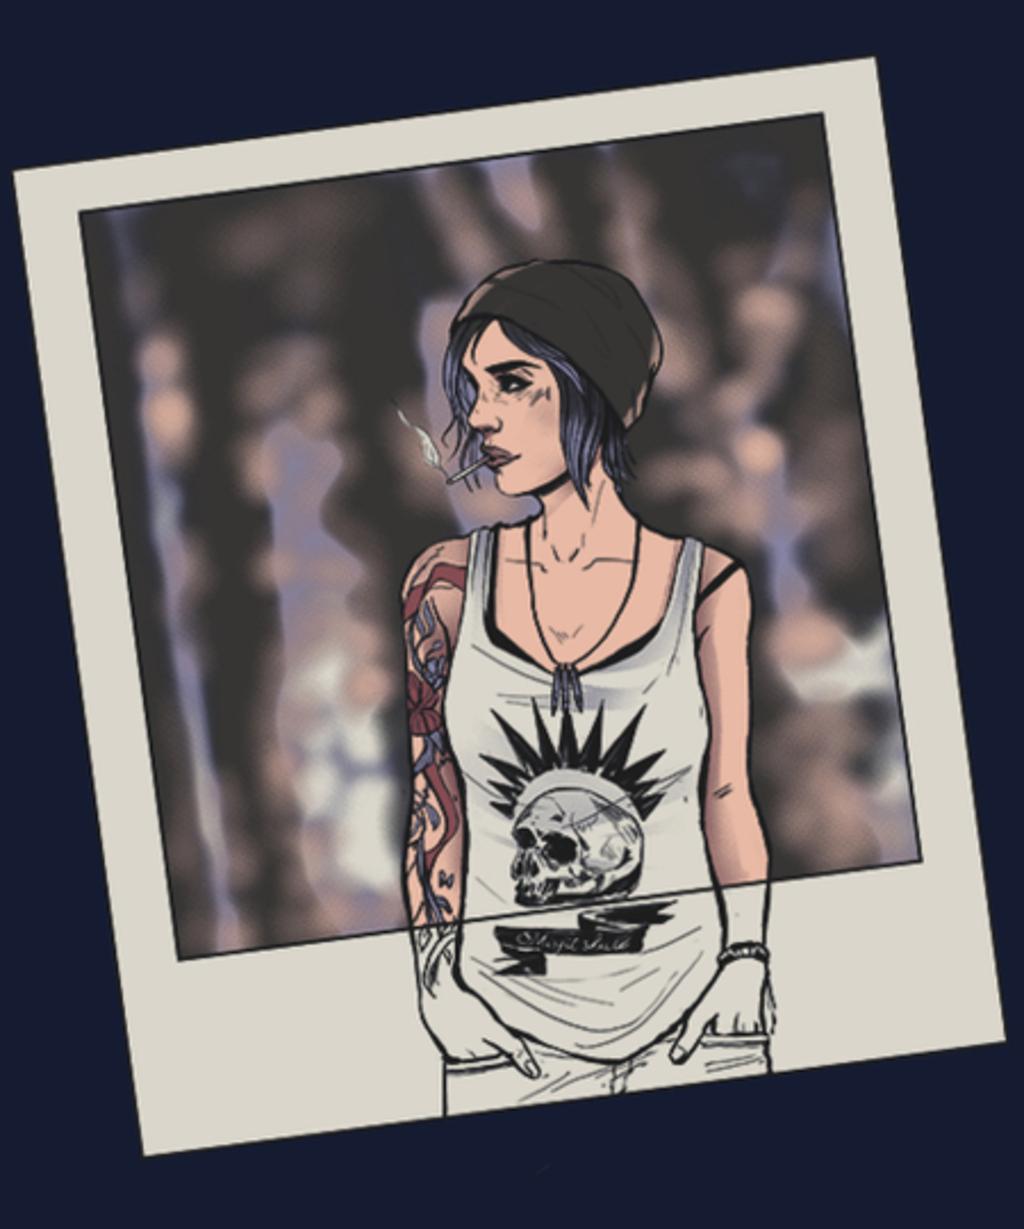 Qwertee: Chloe Polaroid